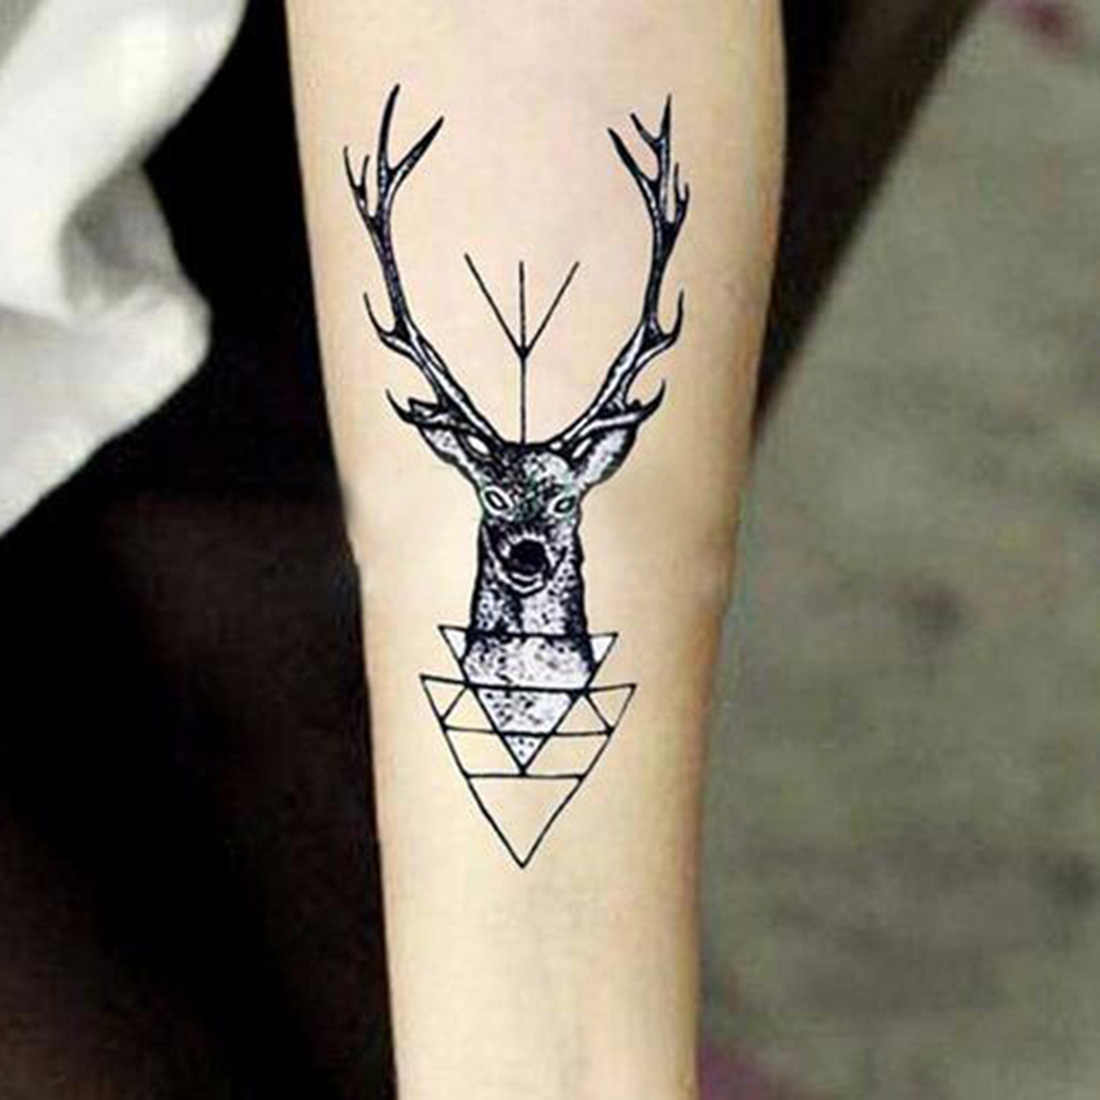 2016 Hot Sale Waterproof Temporary Tattoo Sticker Elk Head Deer Tattoo Bucks Horn Antlers Fake Tattoo For Unisex